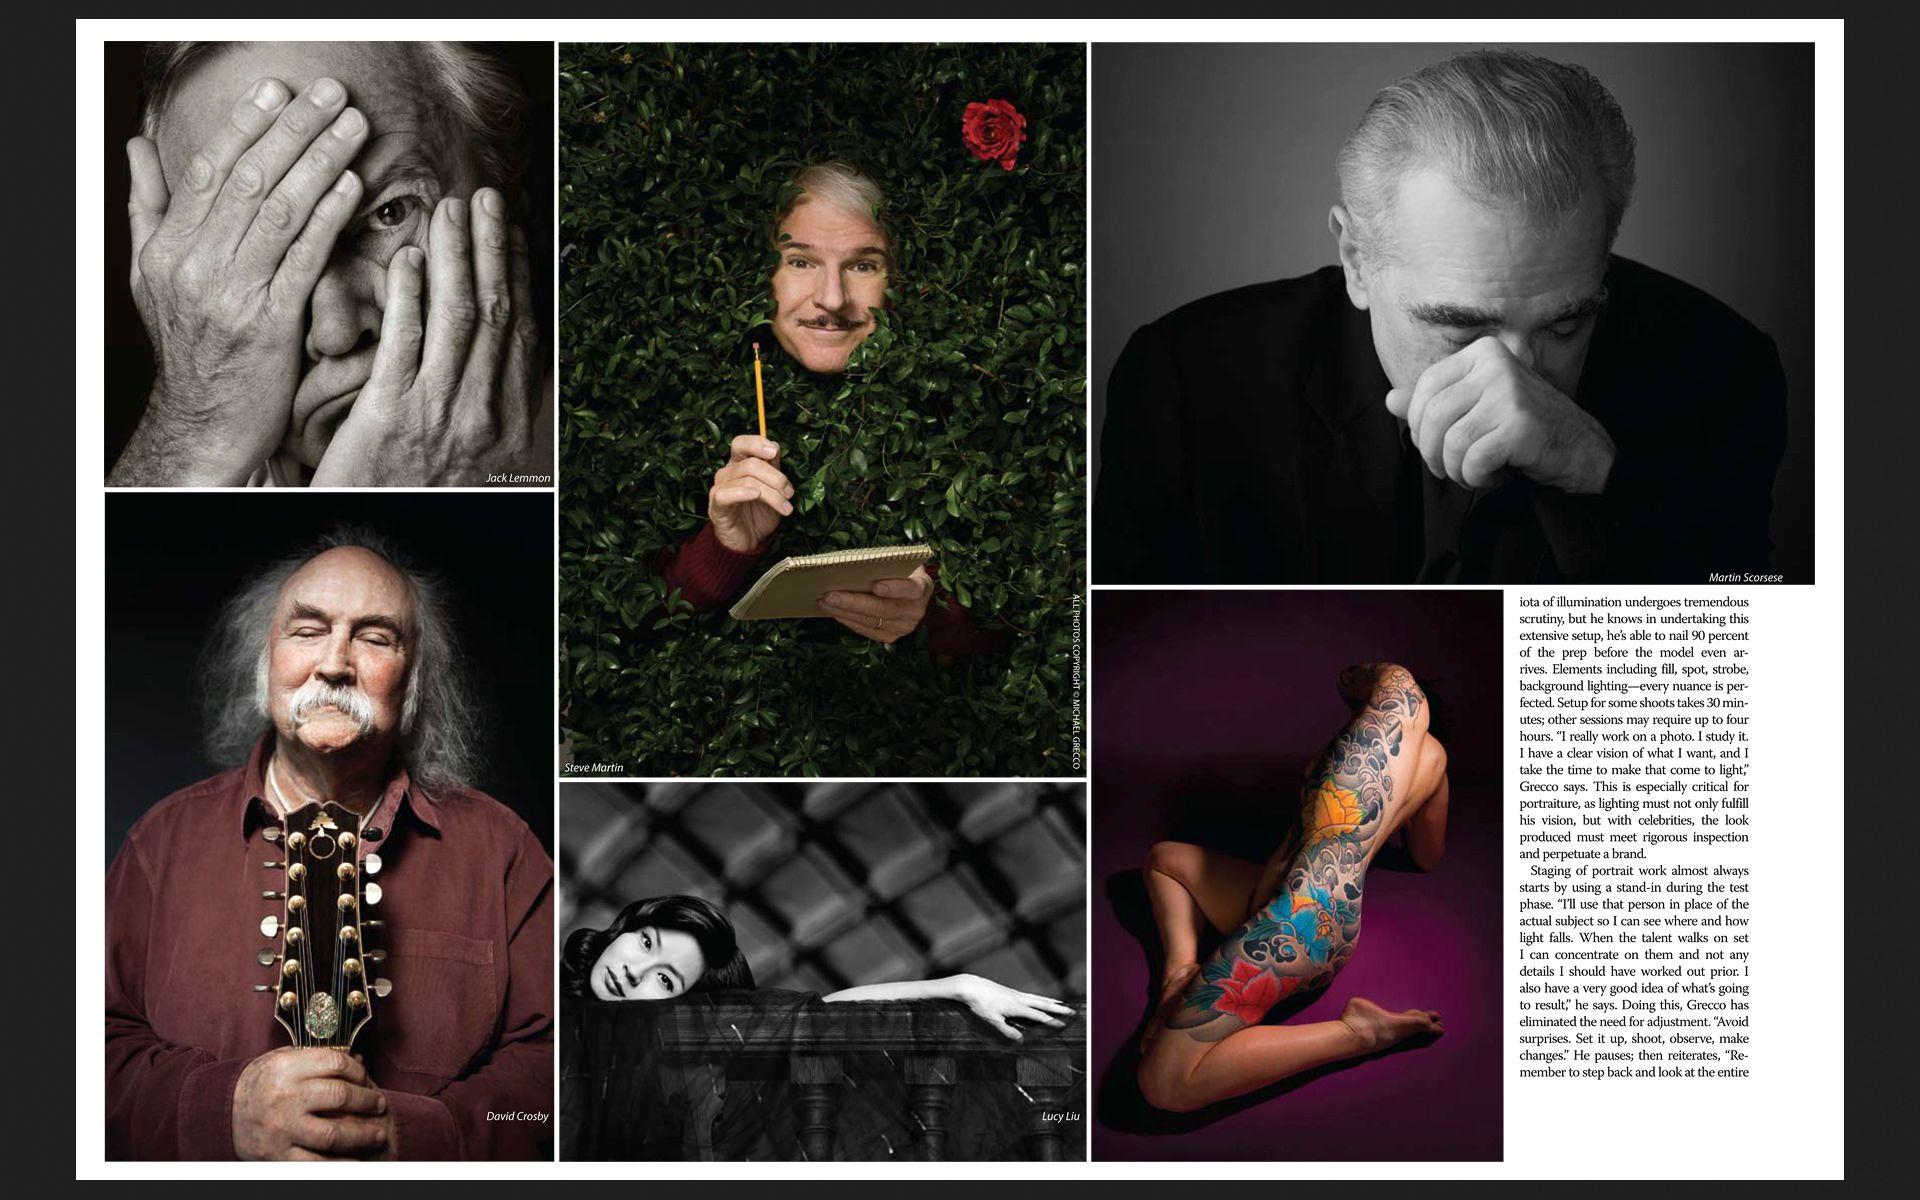 Iconic-Celebrity-Portrait-Photographer-Michael-Grecco.jpg